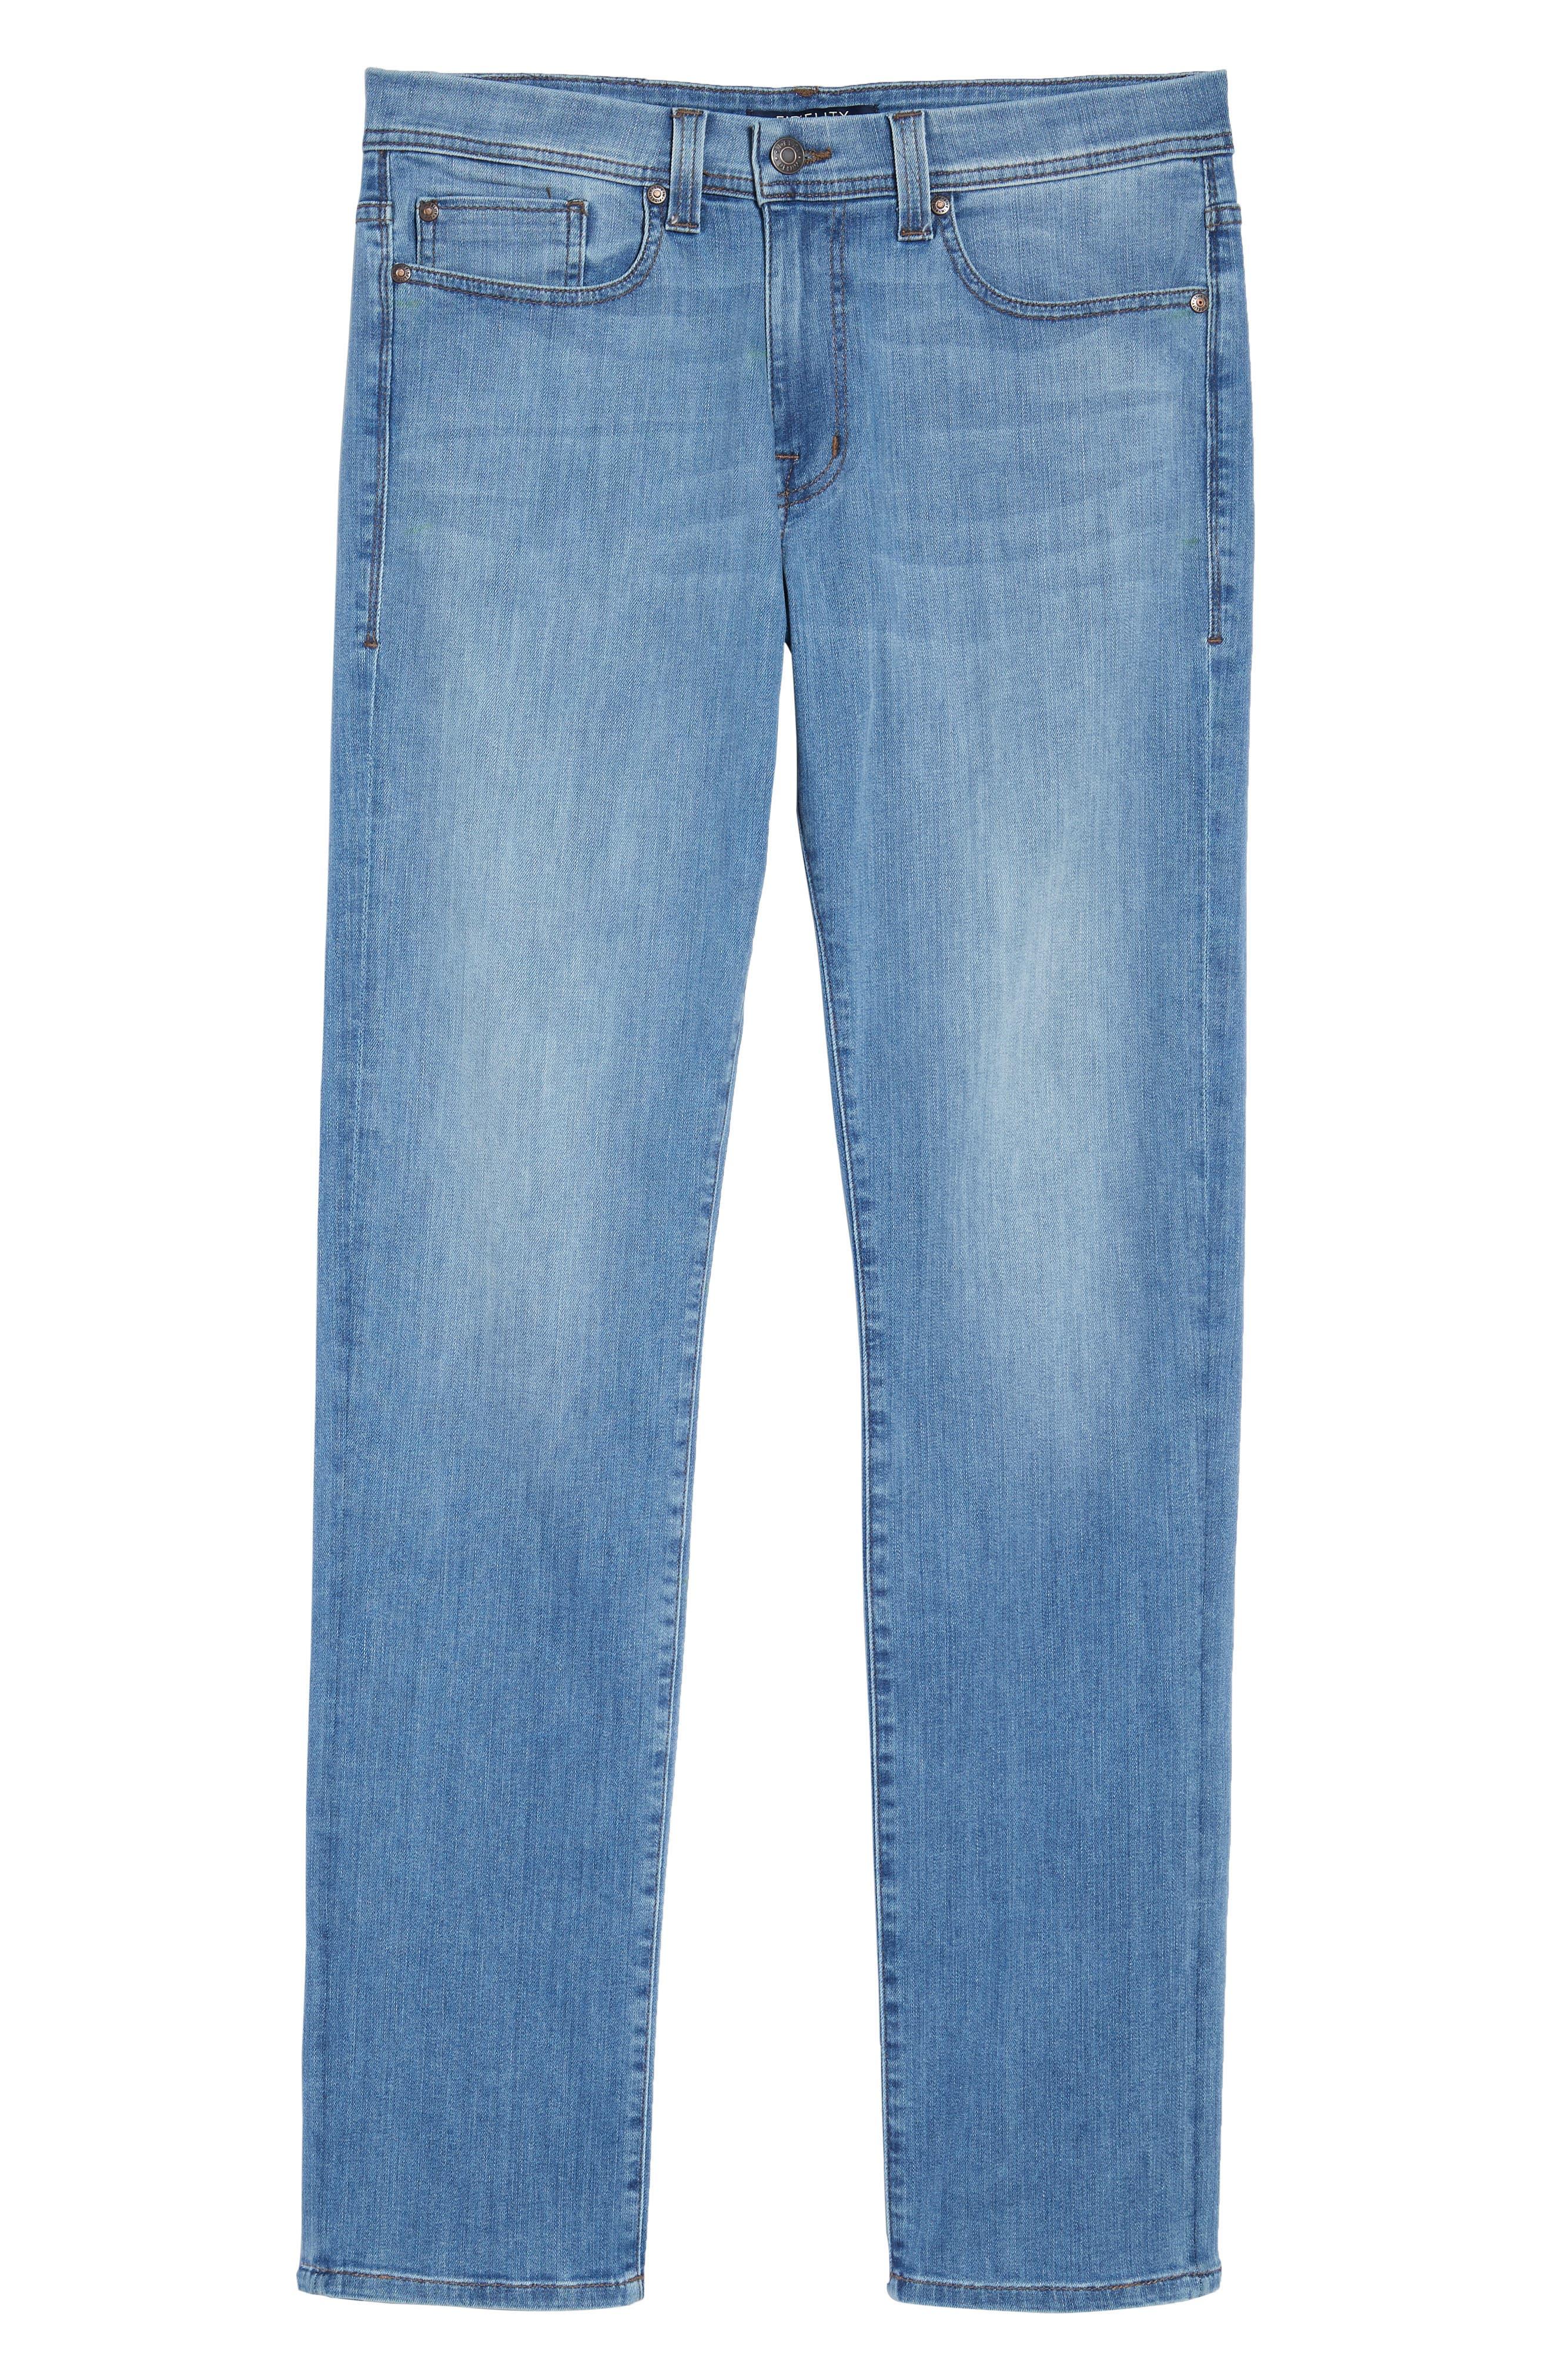 Jimmy Slim Straight Fit Jeans,                             Alternate thumbnail 6, color,                             Brixton Blue